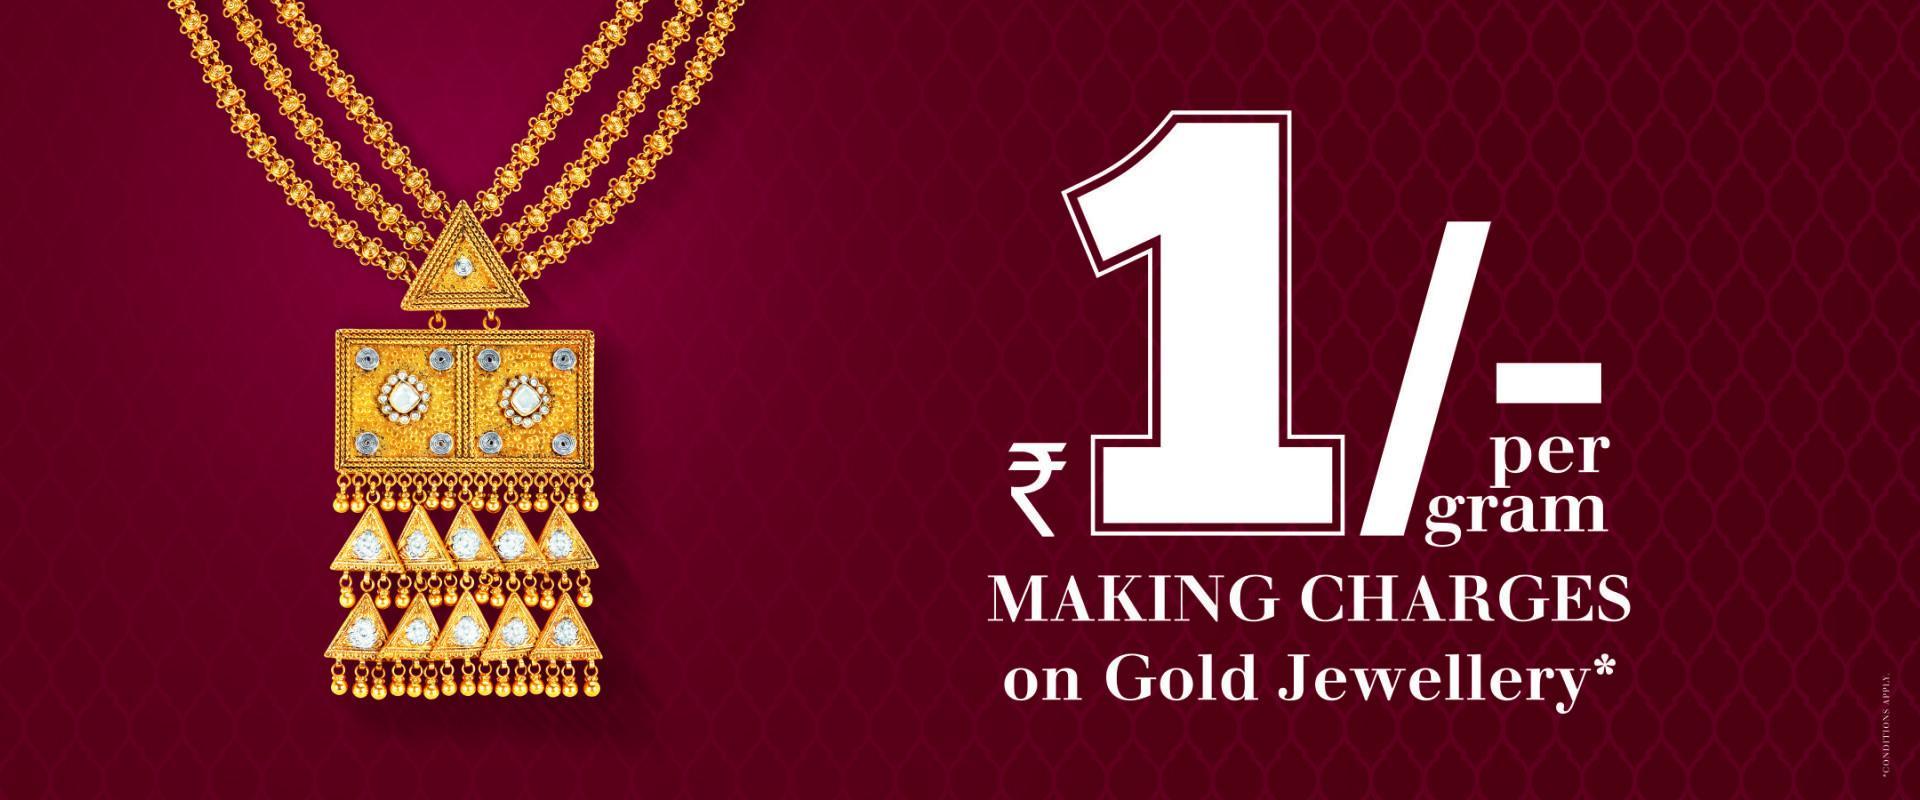 TBZ The Original - Gold and Diamond Jewellery